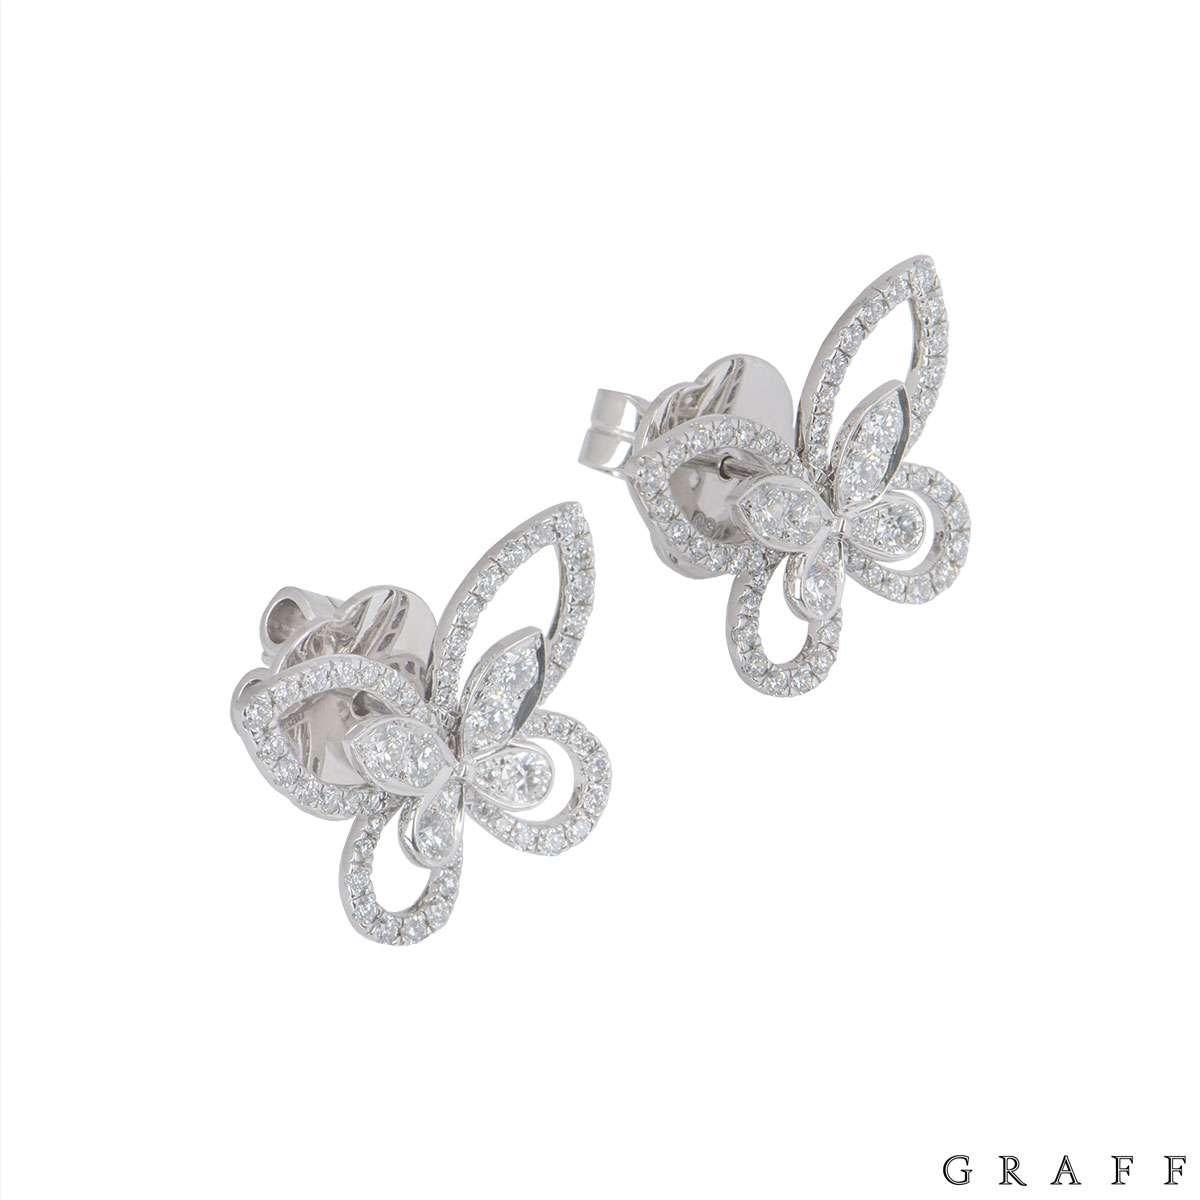 Graff White Gold Diamond Butterfly Earrings